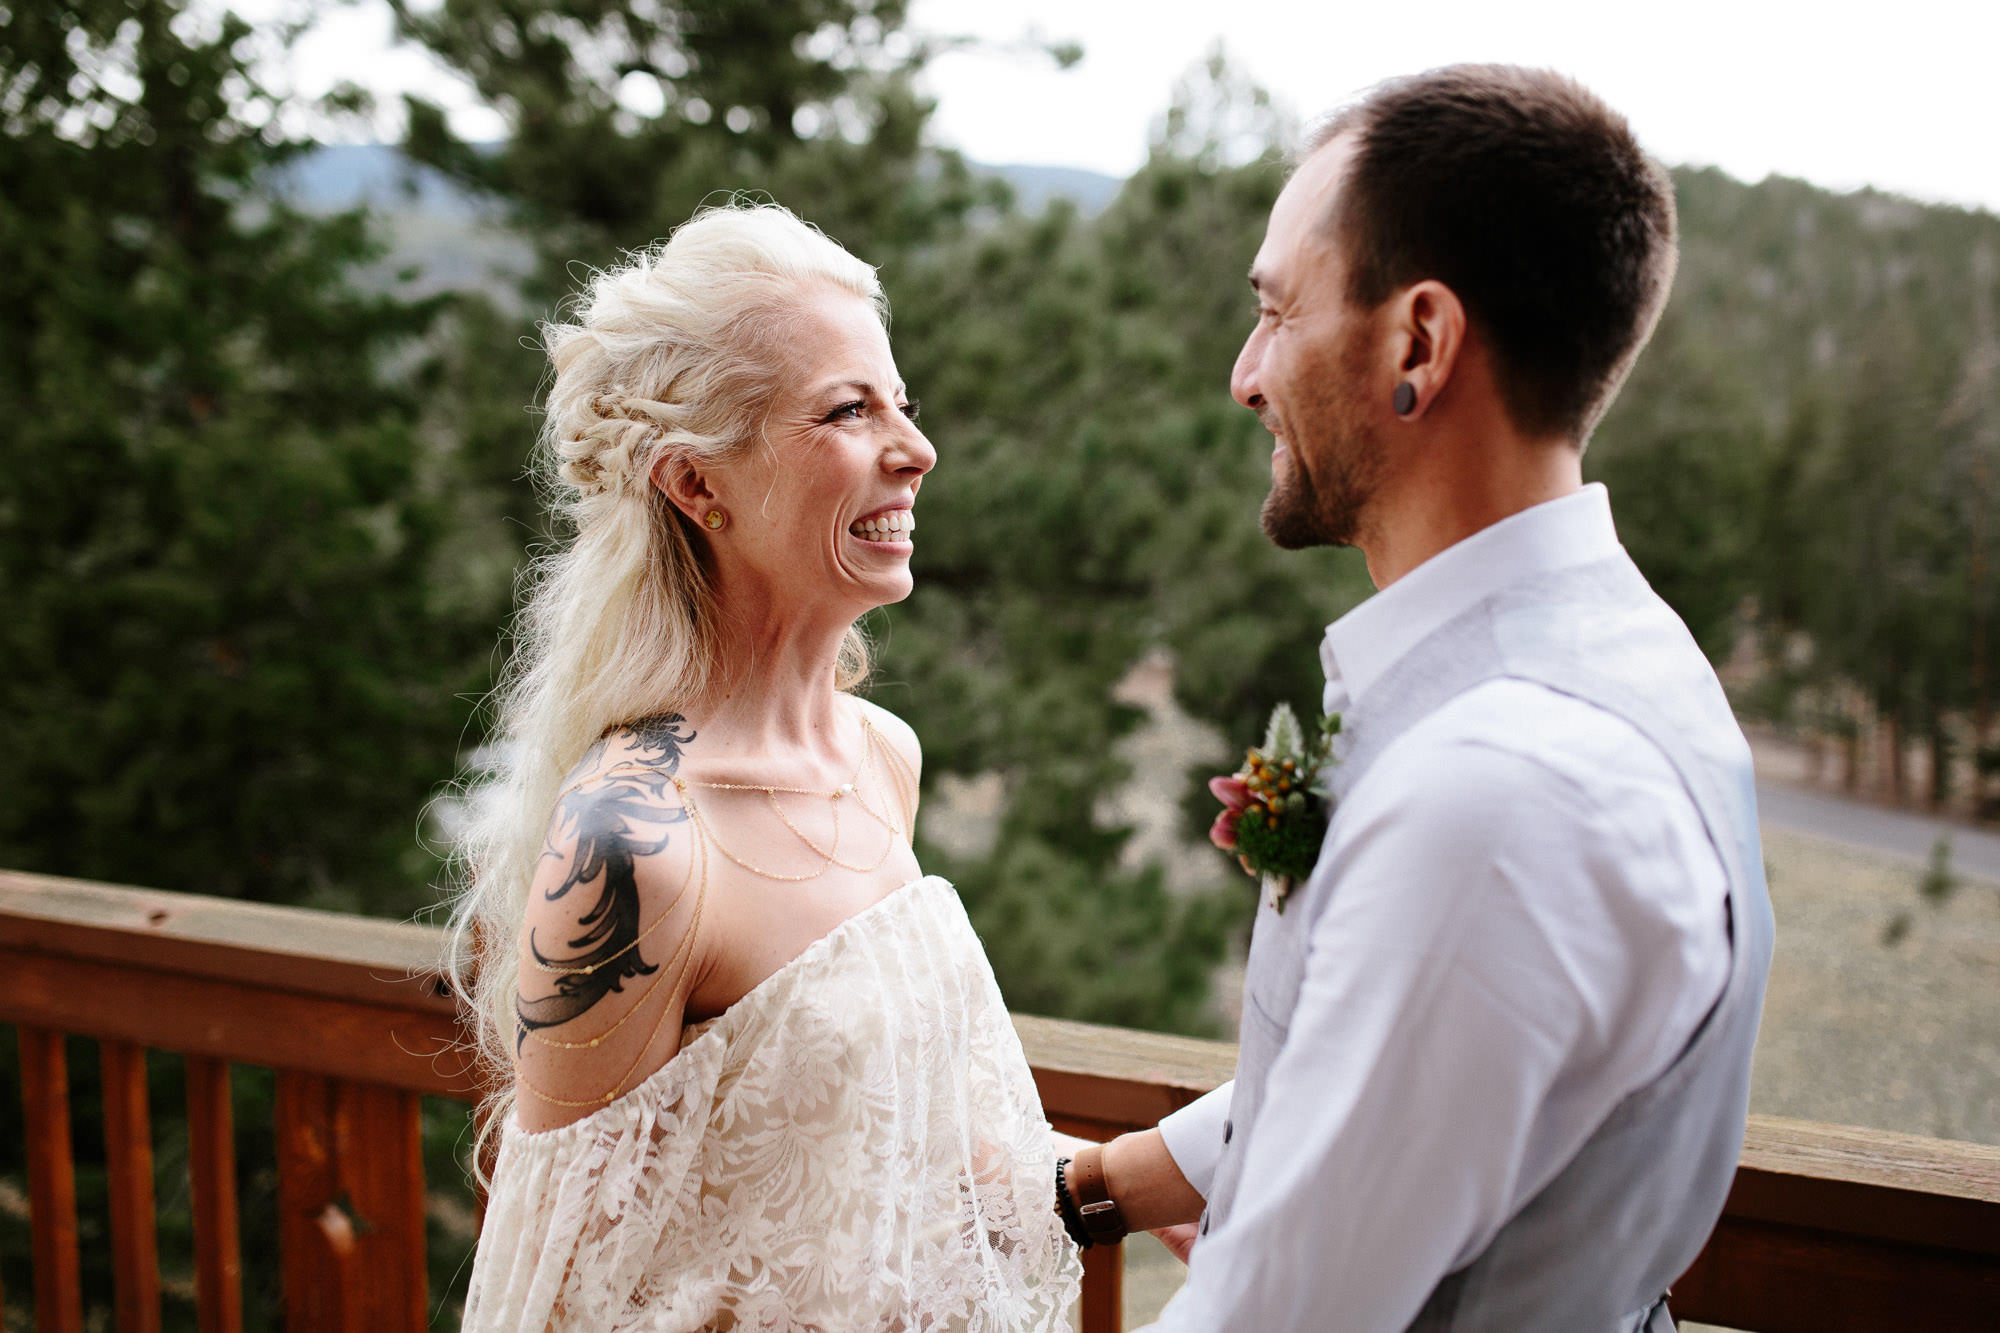 bucci-barn-wedding-elopement-evergreen-boulder-denver-colorado-adventerous-romantic-timeless-039.jpg